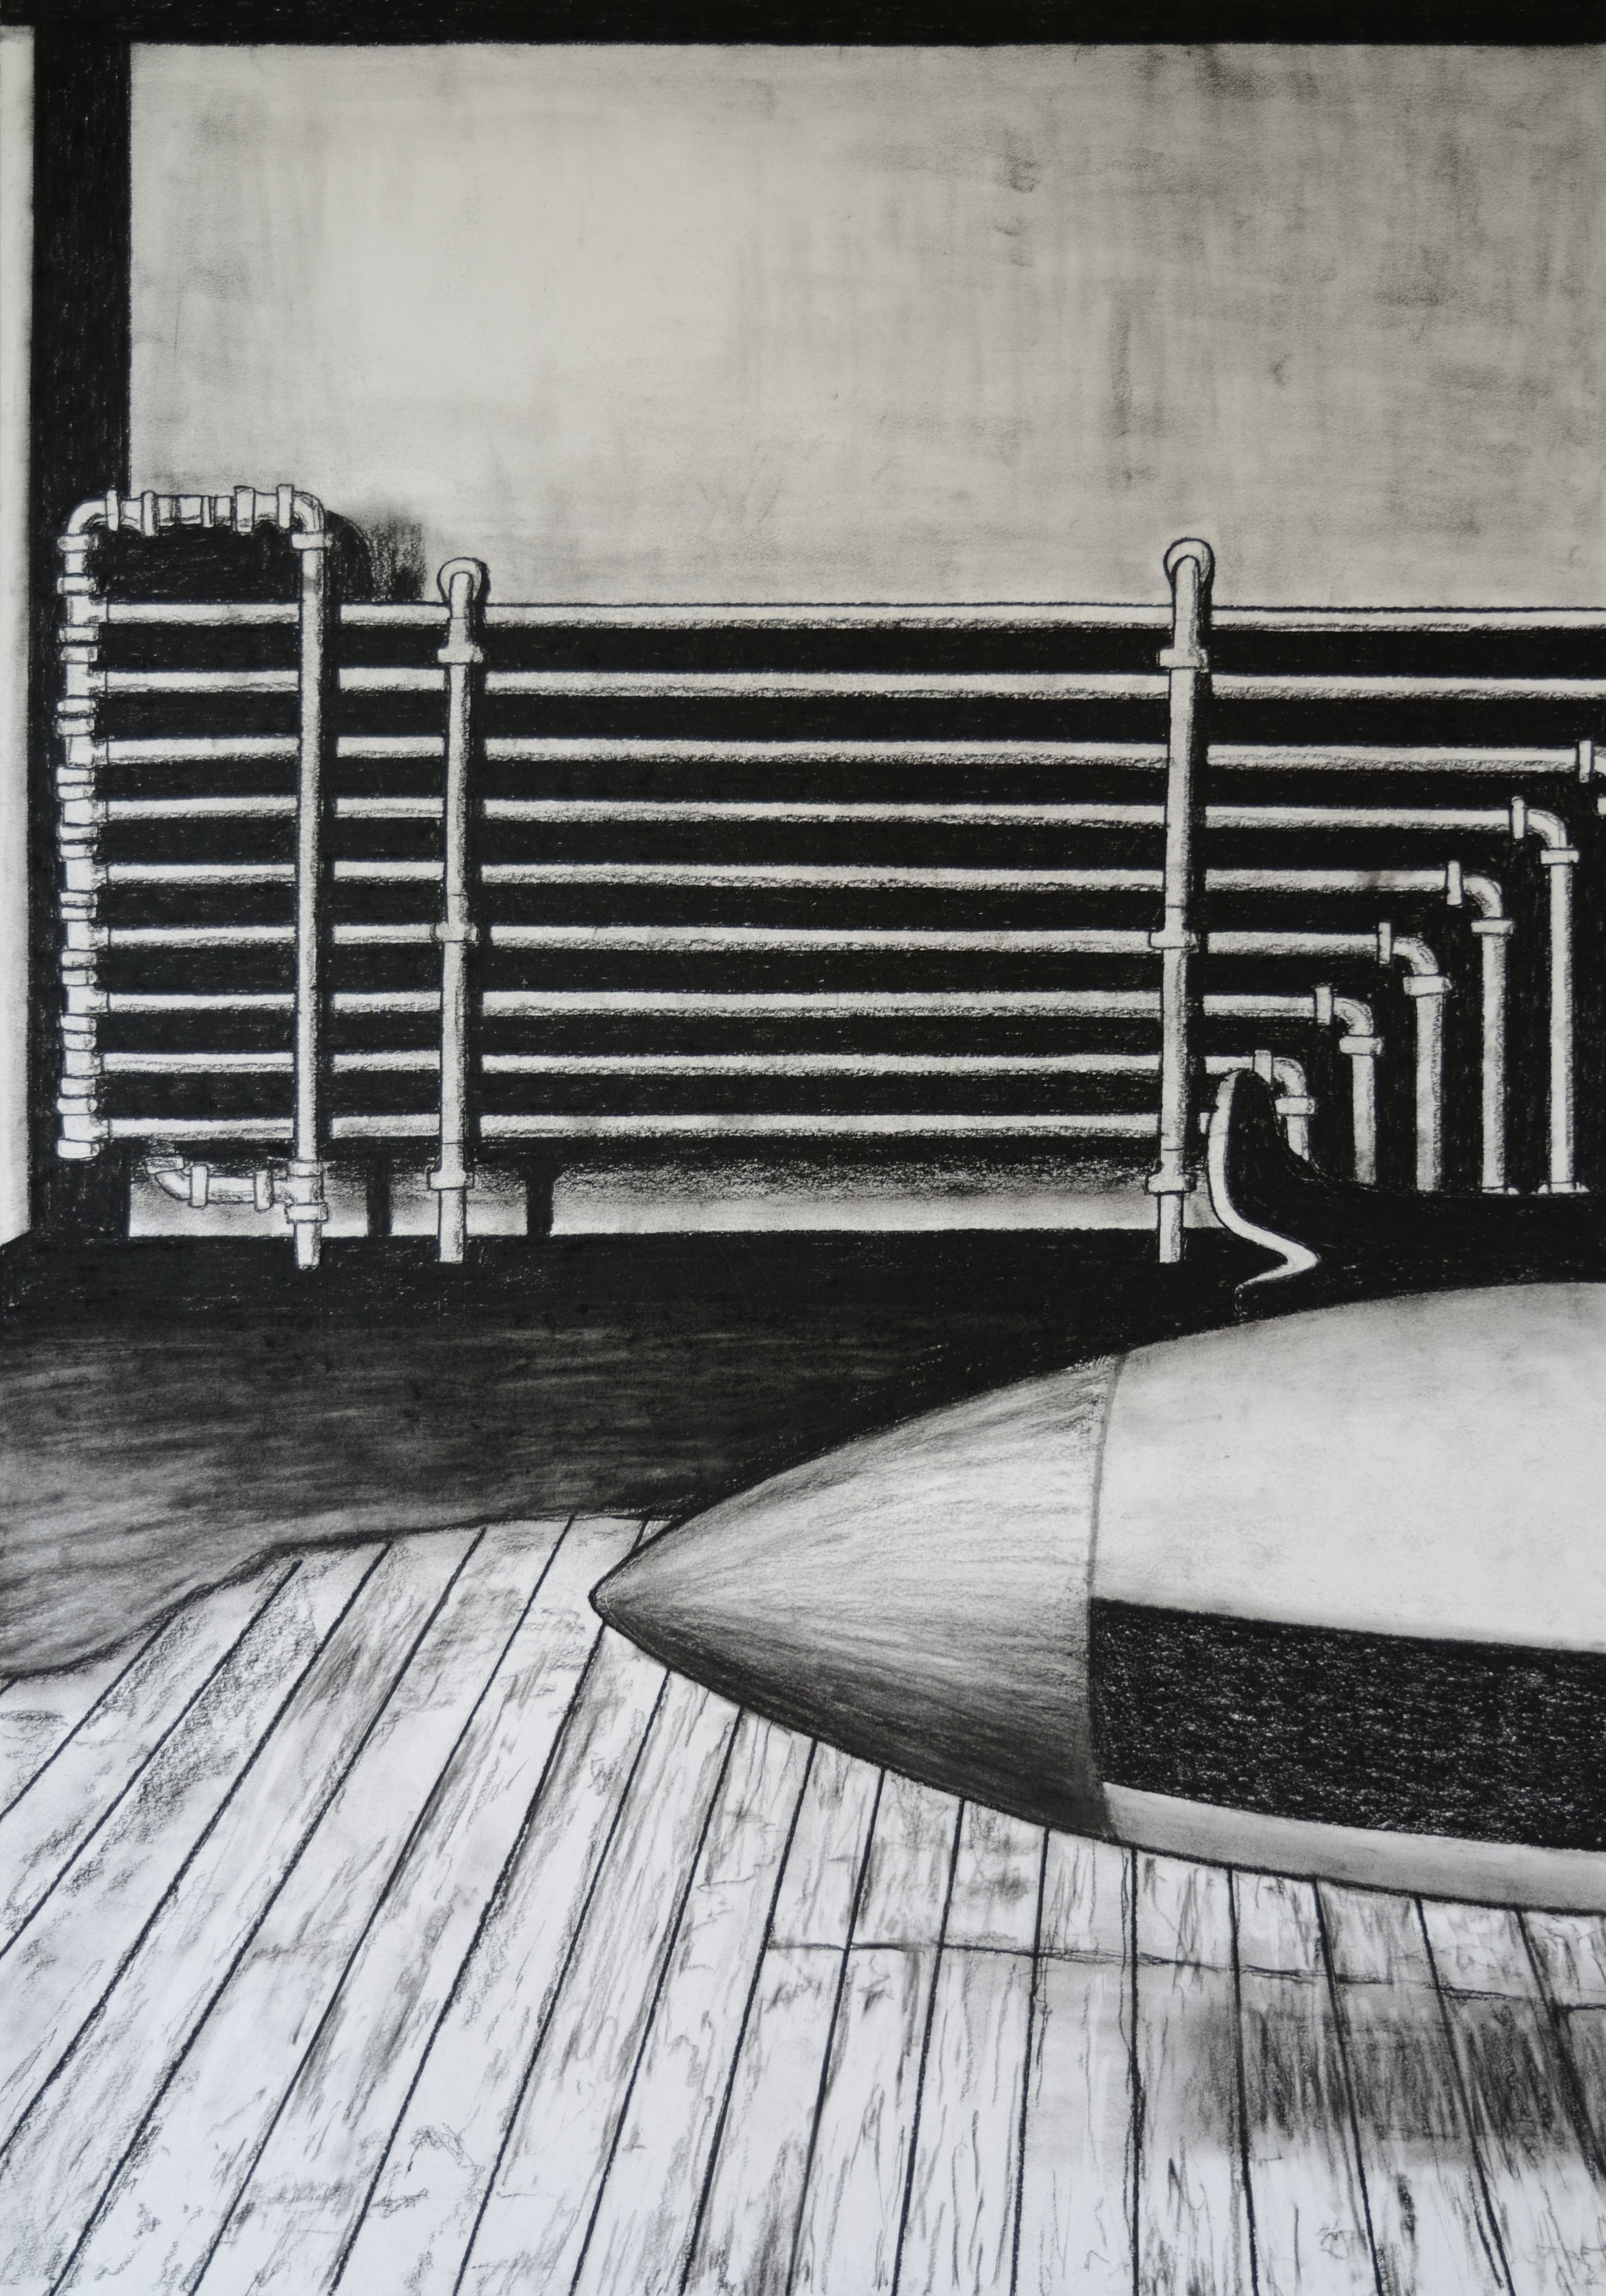 The Hangar, 100x70cm, conte on paper